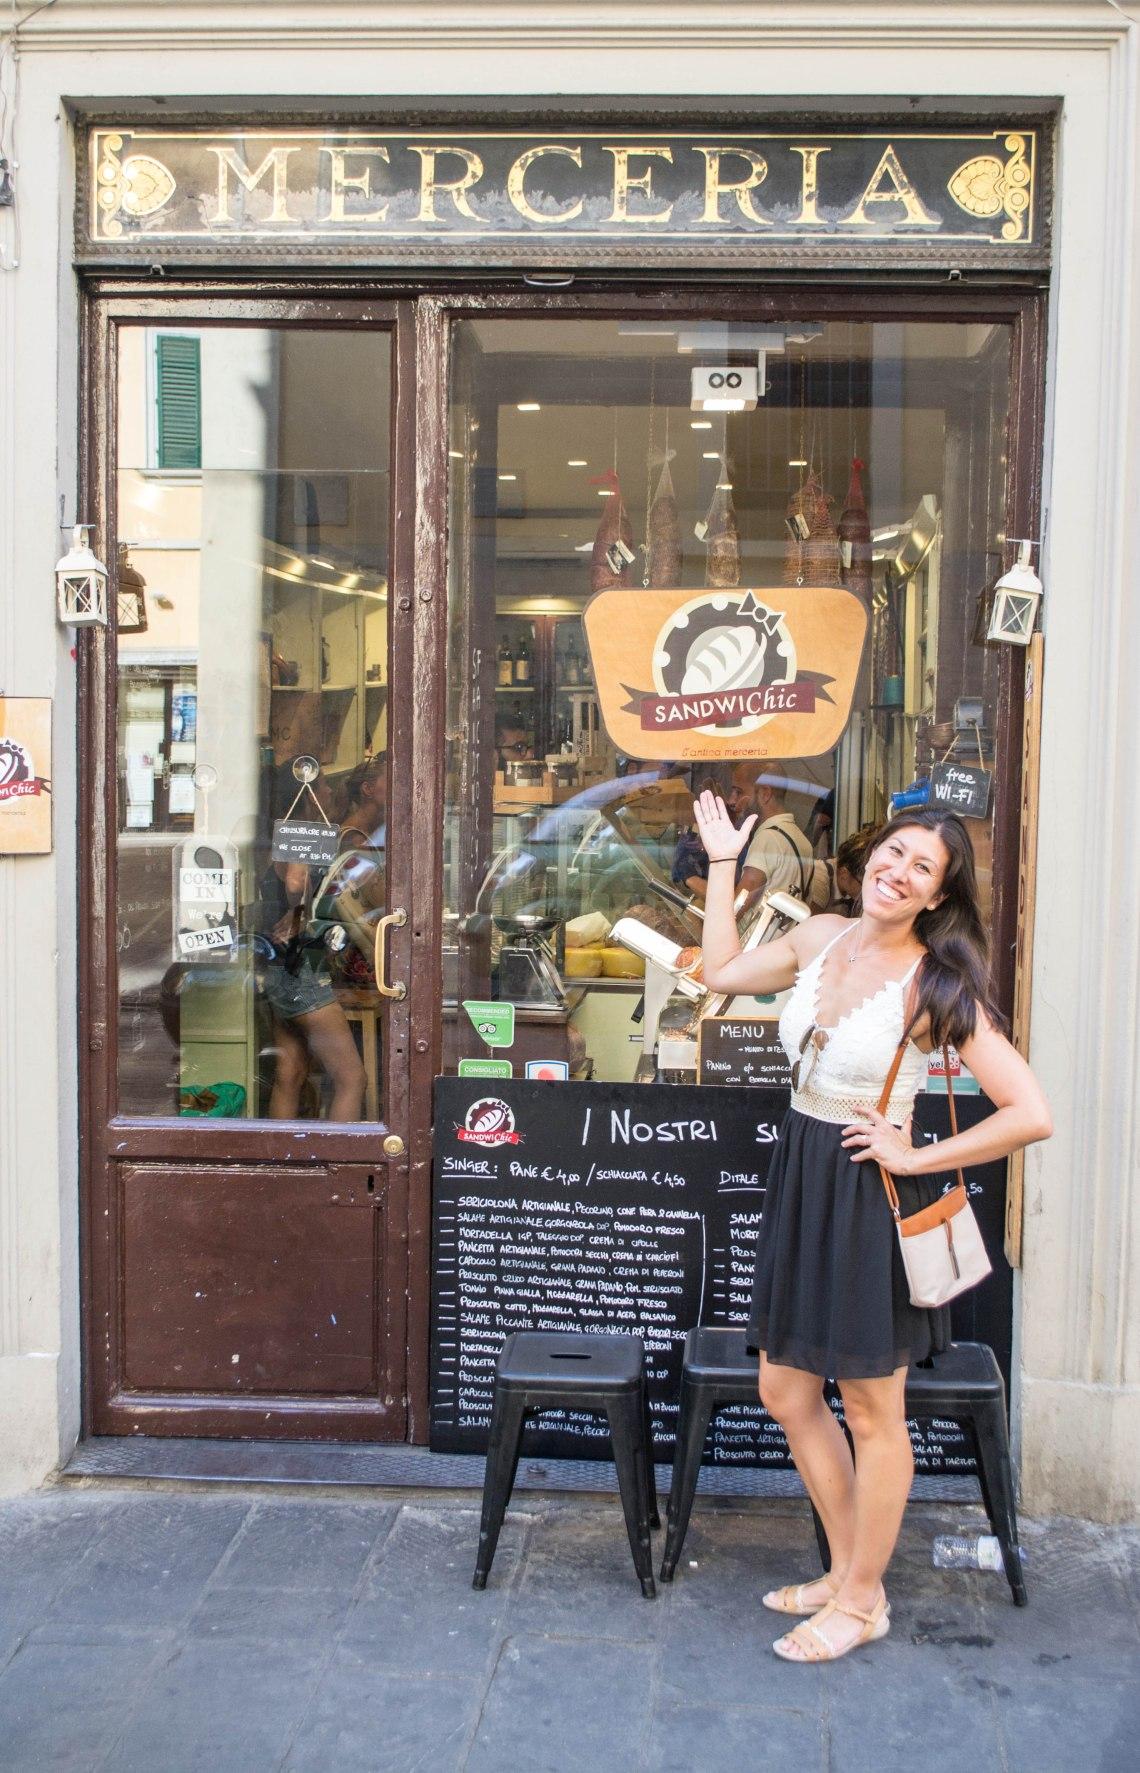 Sandwichic - Florence, Italy